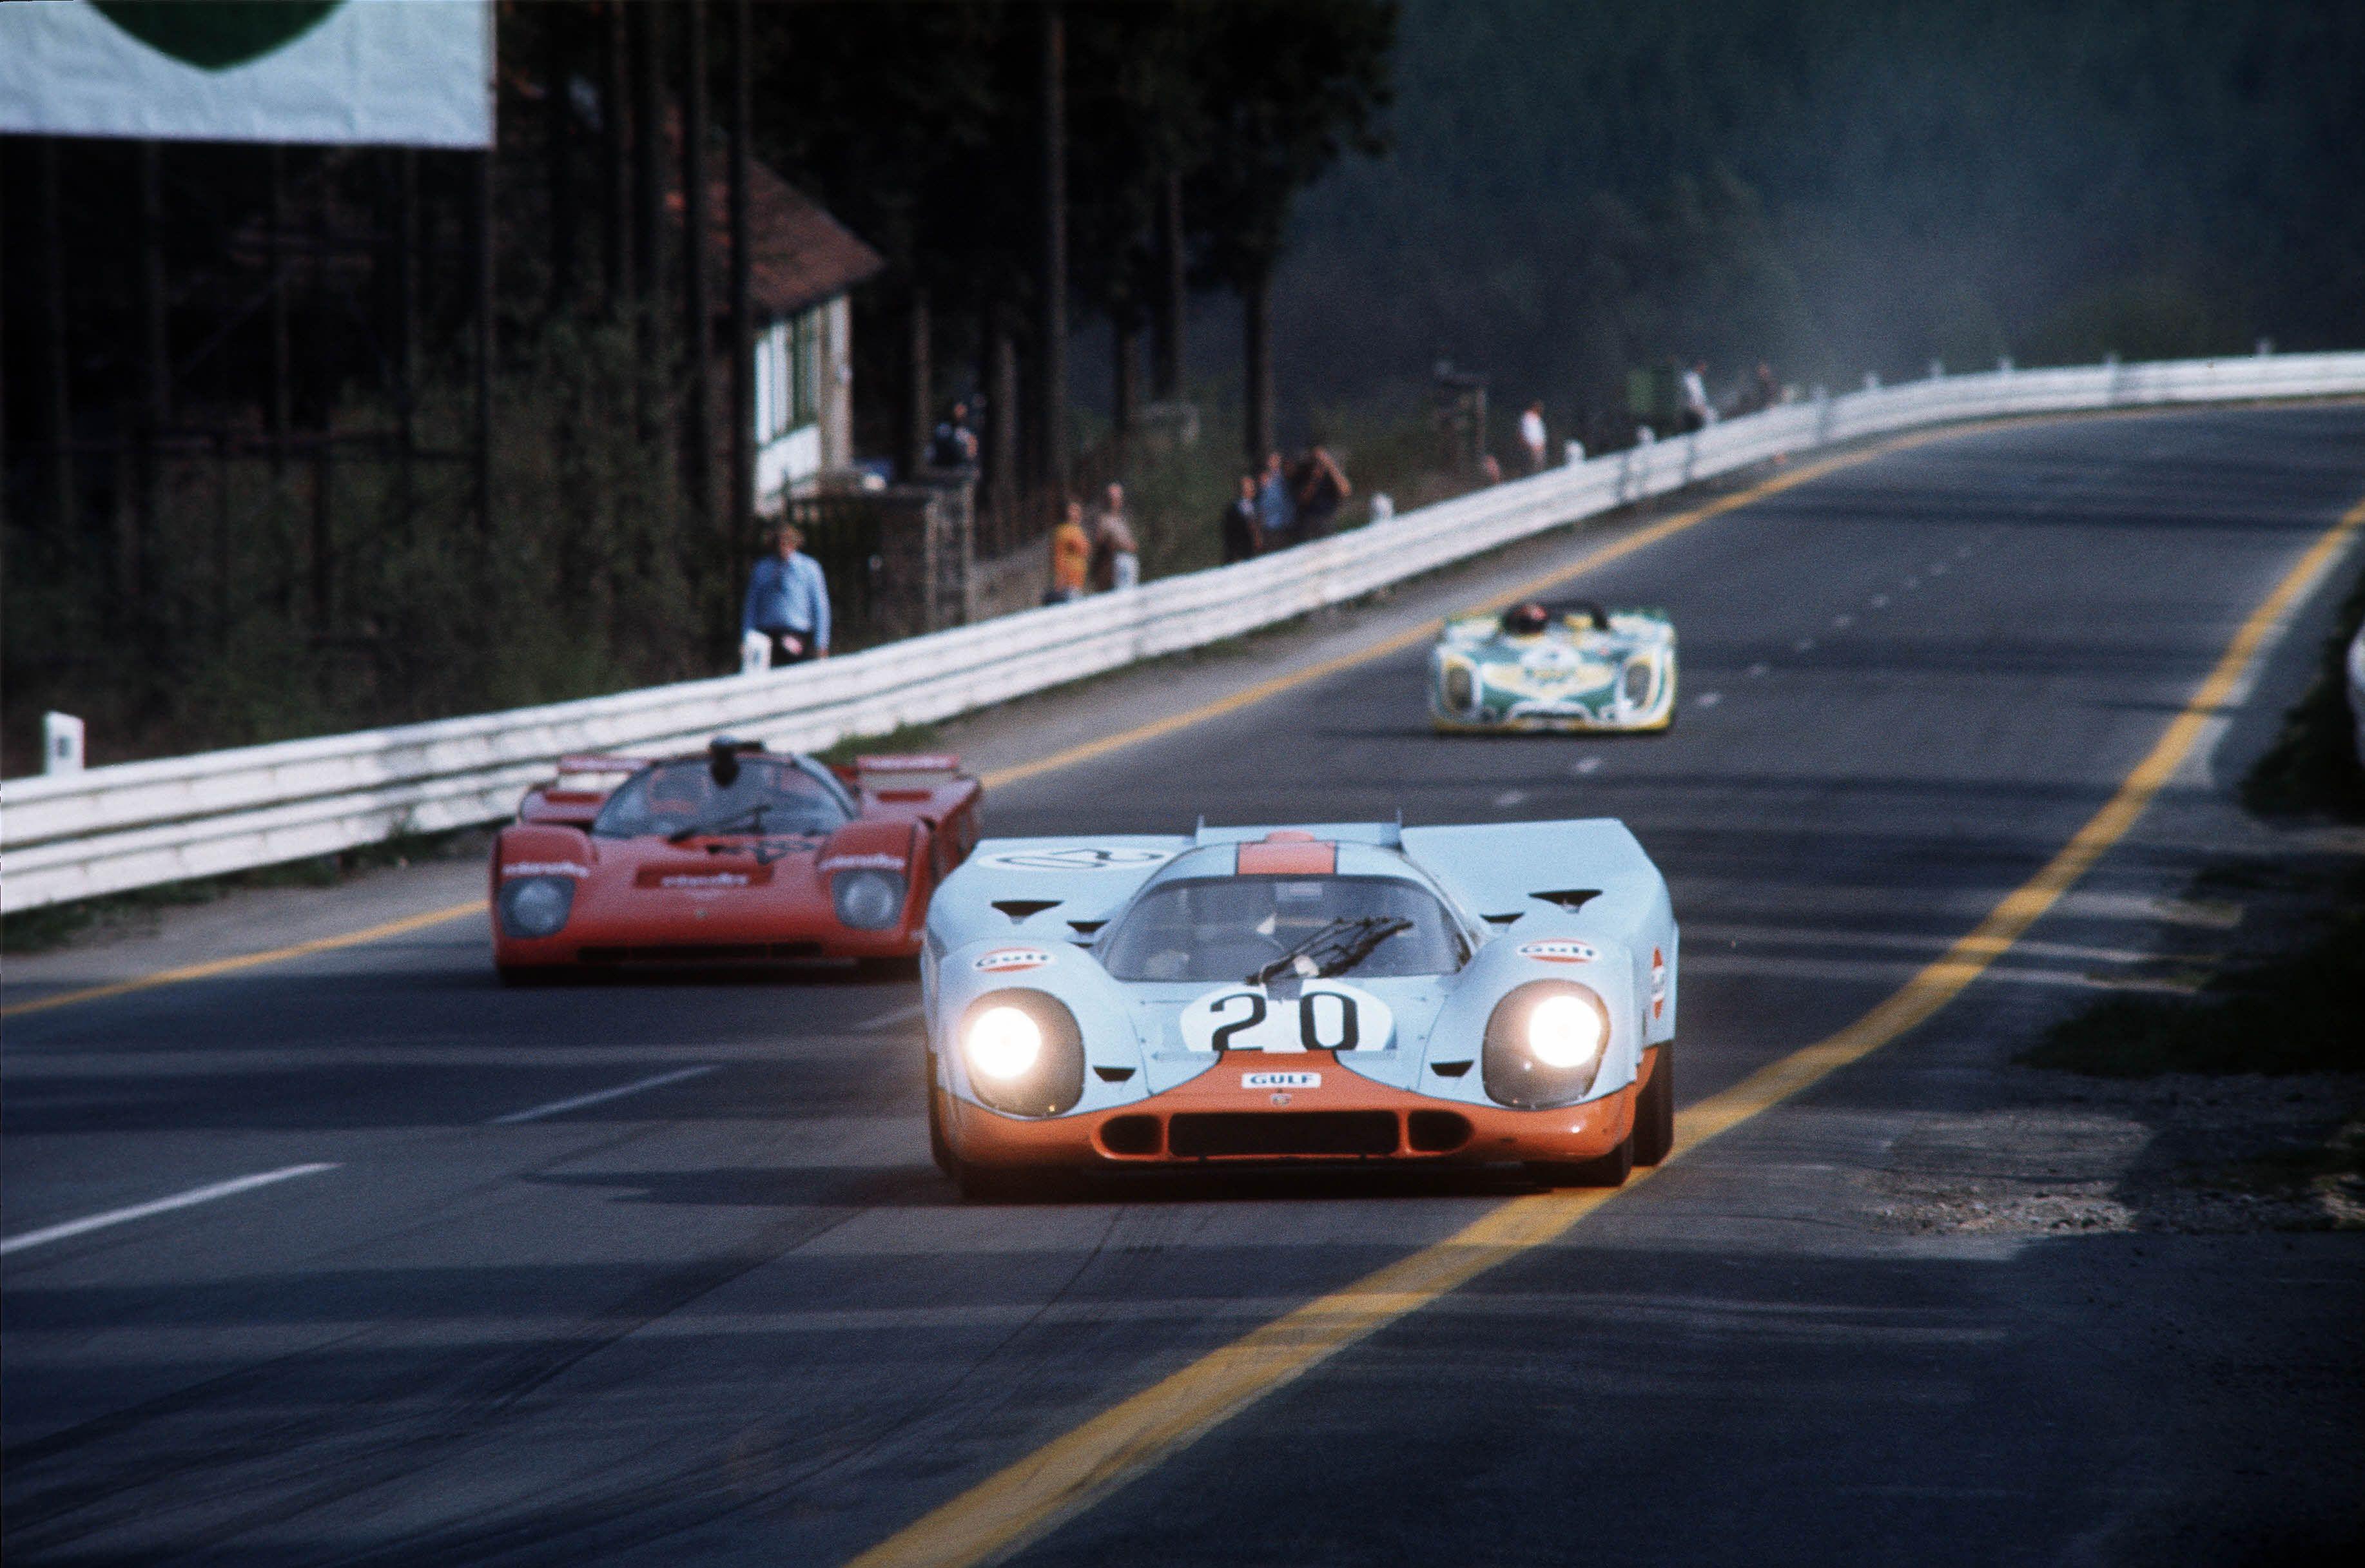 Jo Siffert Brian Redman 20 Porsche 917k John Wyer Automotive